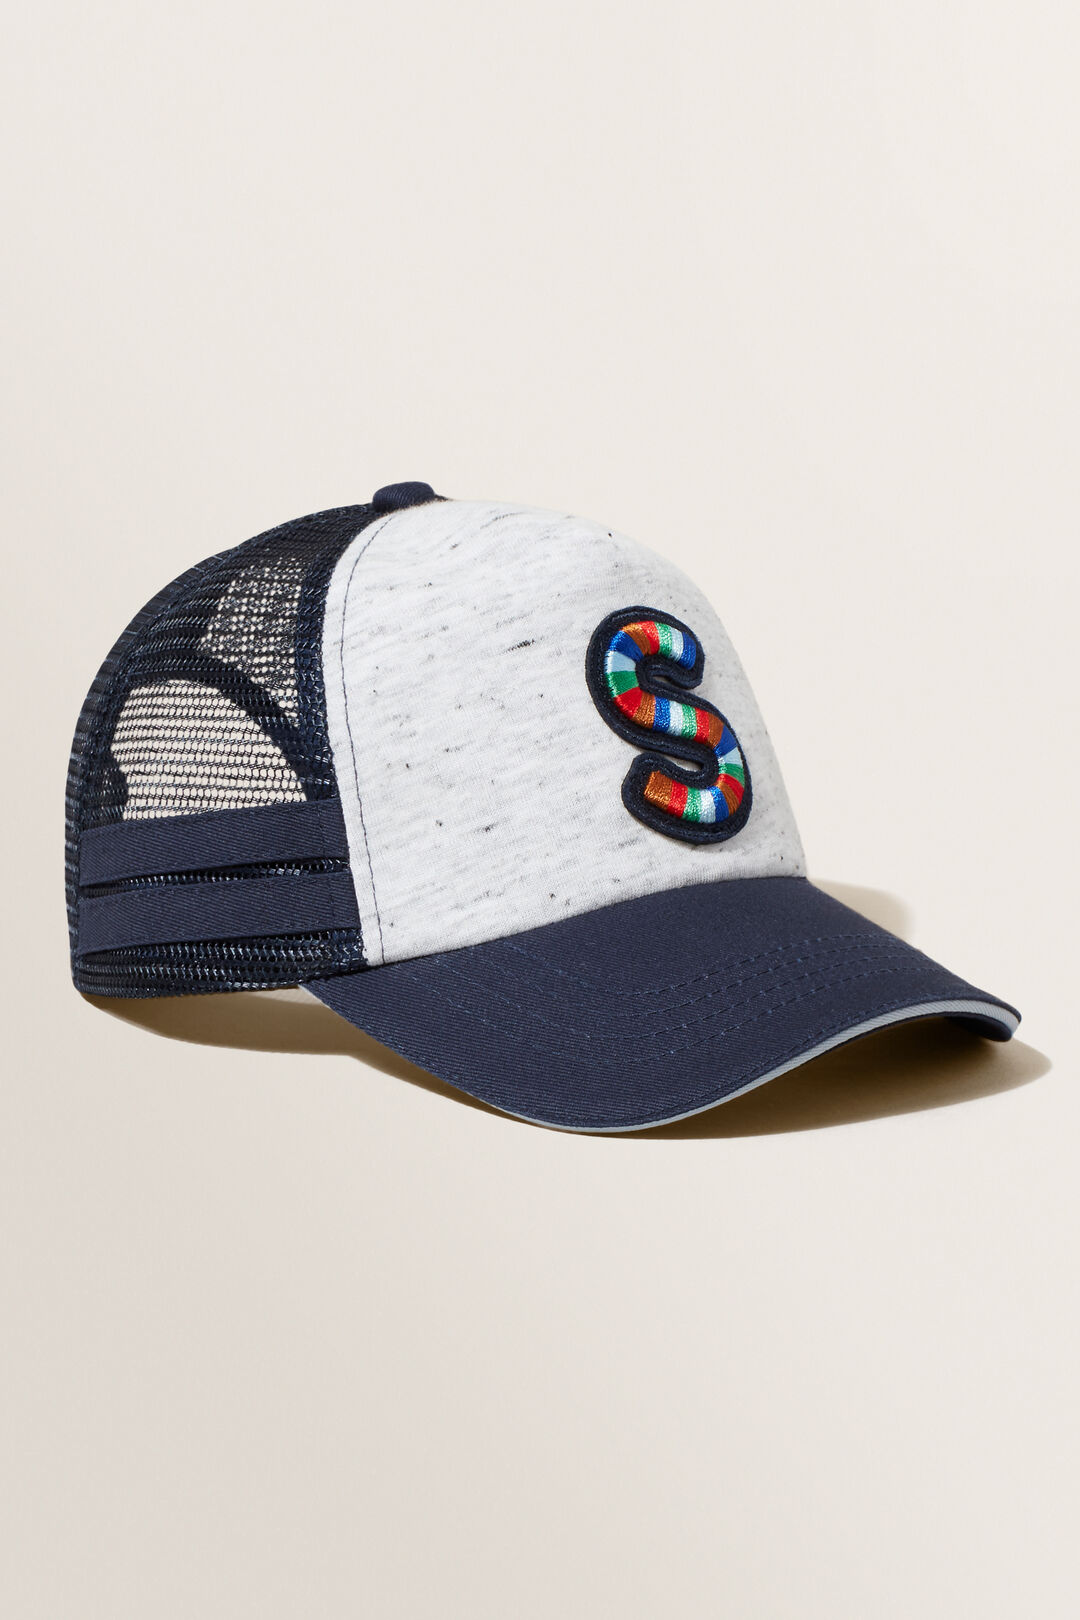 Embroidered Initial Cap  S  hi-res